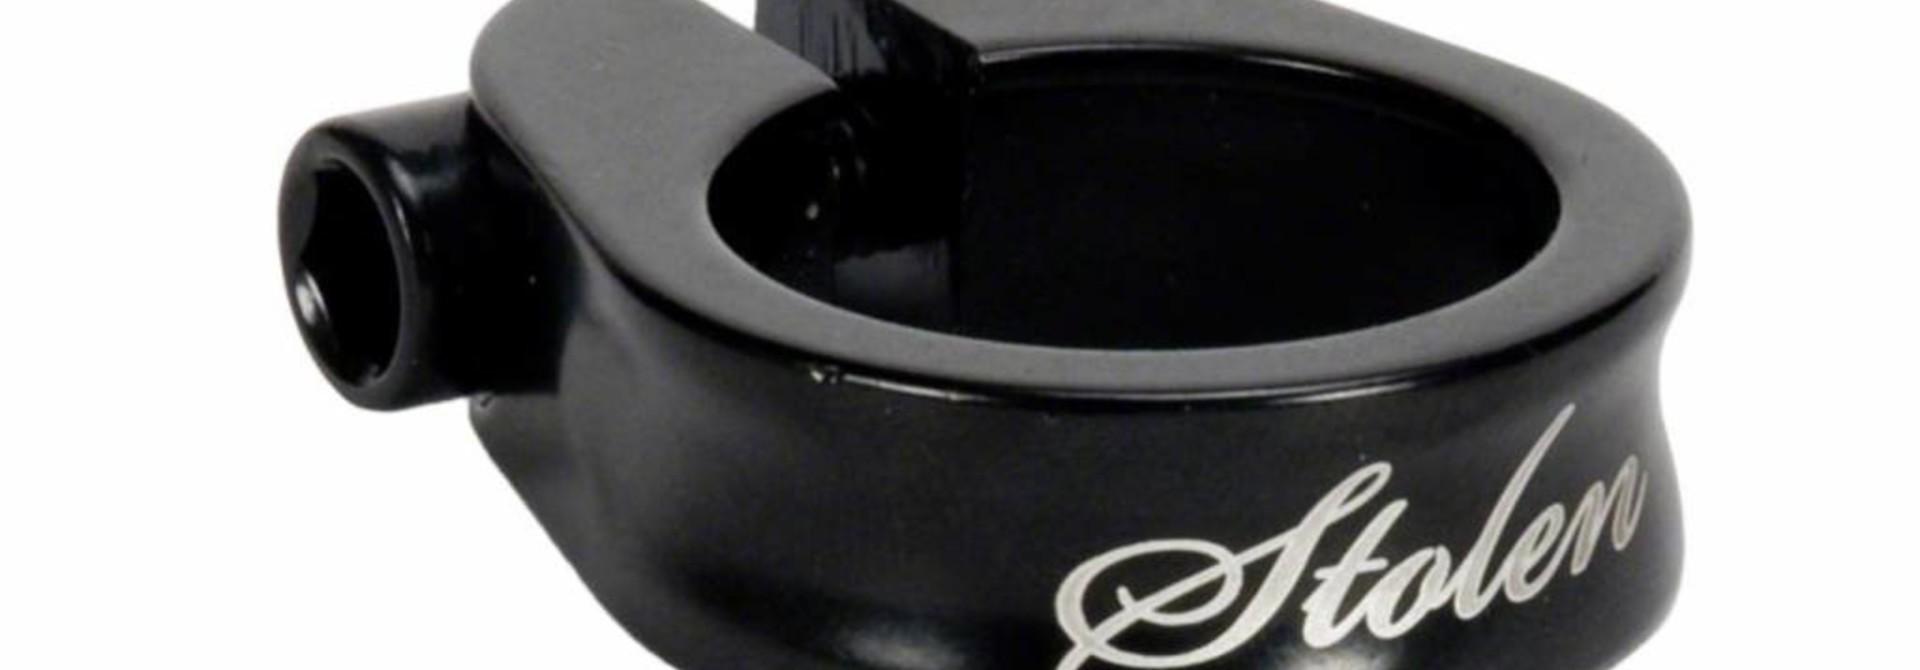 CHOKER BLACK SEAT CLAMP